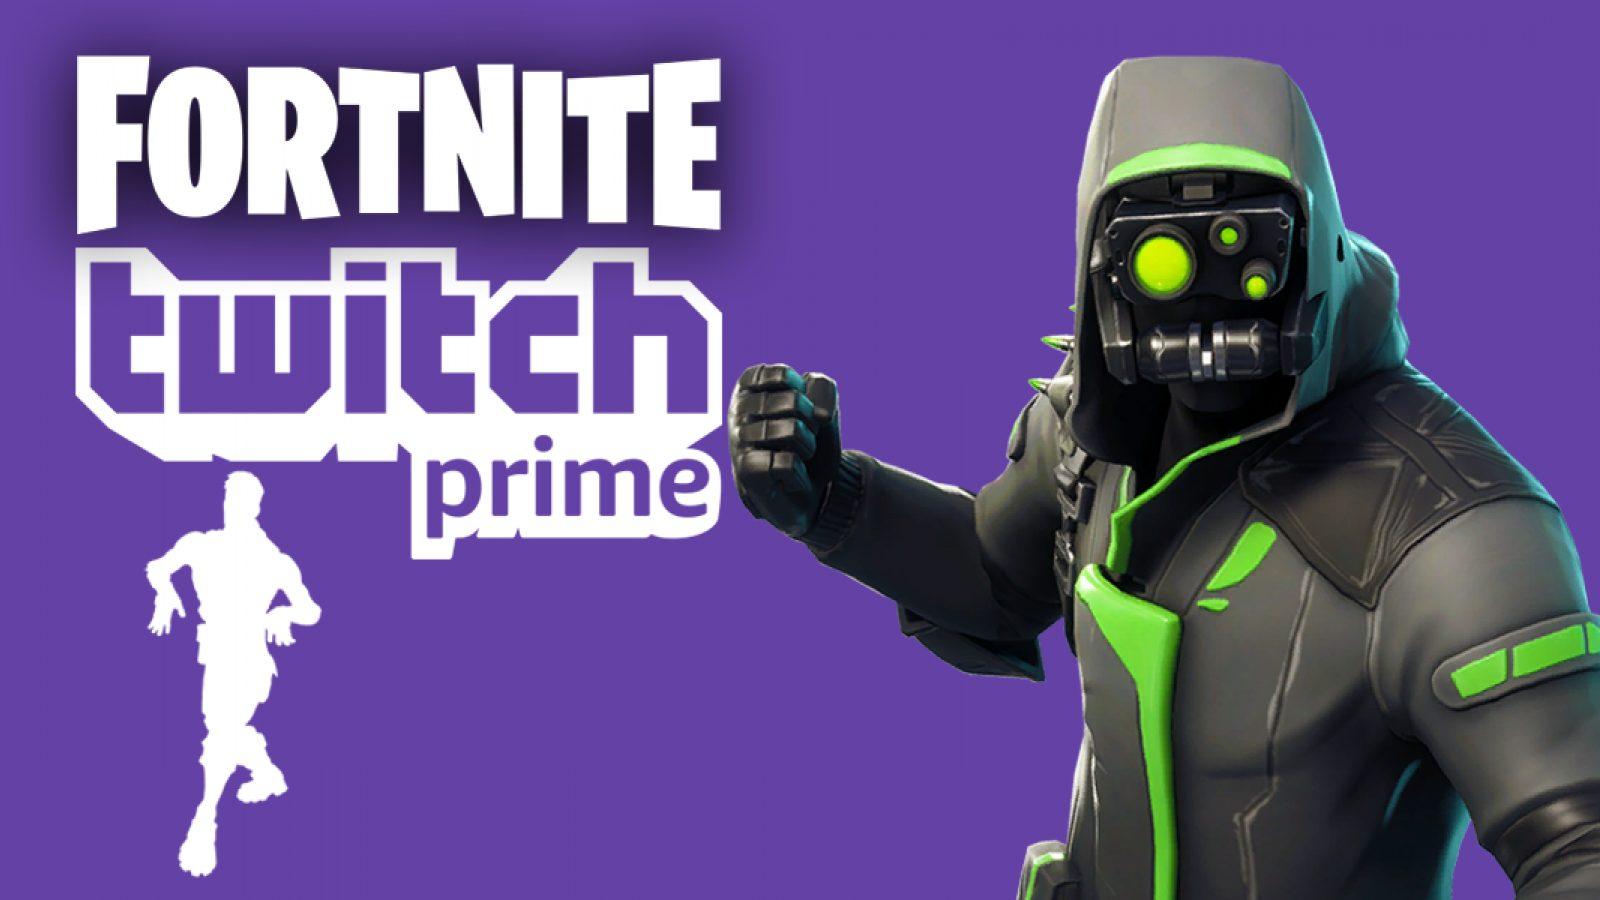 Fortnite skin on twitch